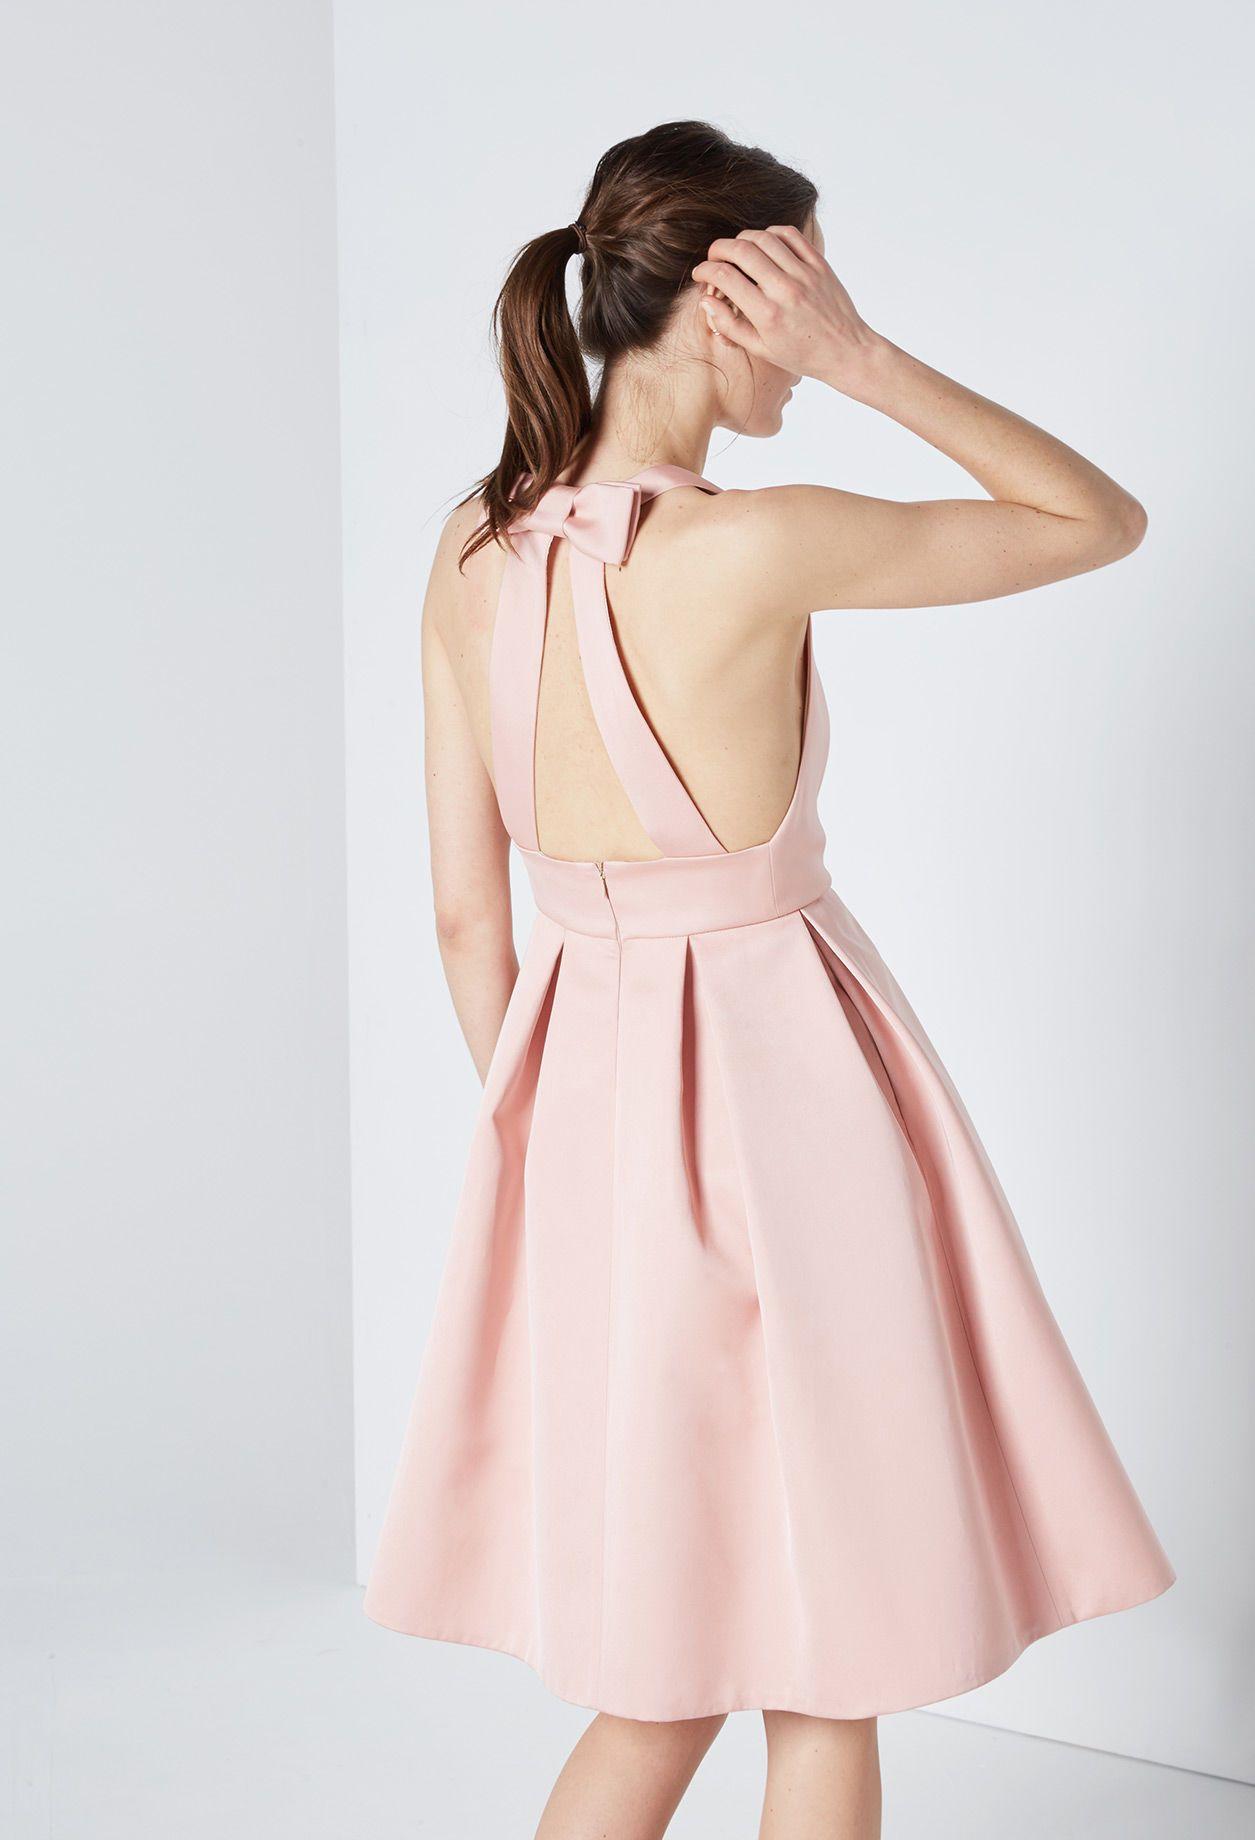 Claudie Roze Robe Bis Et Pierlot Dresses Catégories Sary 1w7wAq